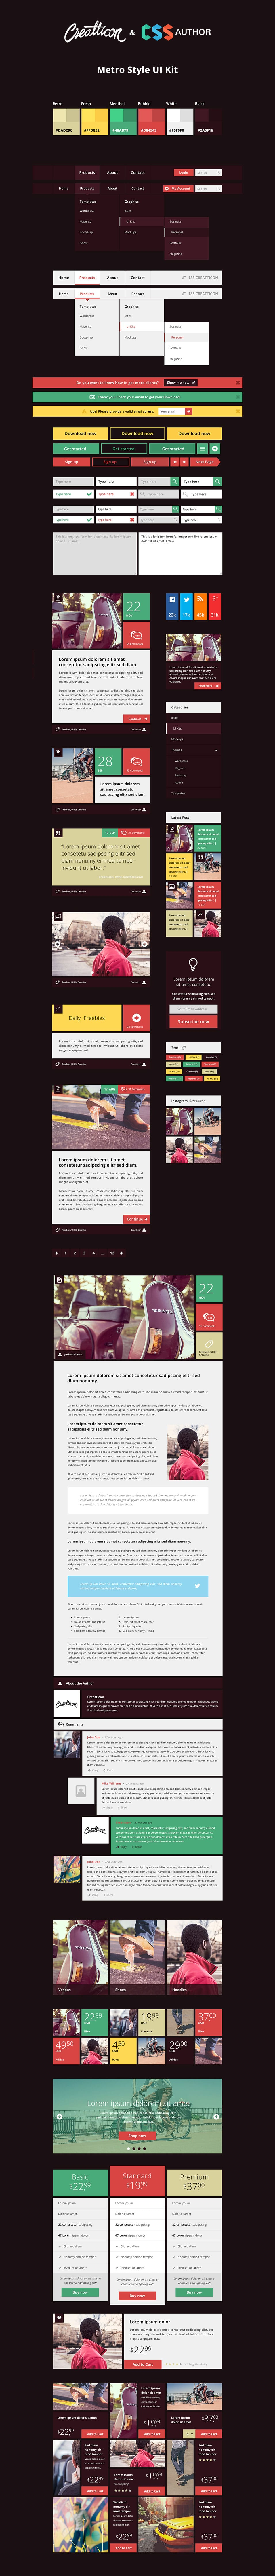 Creatticon UI Kit PSD